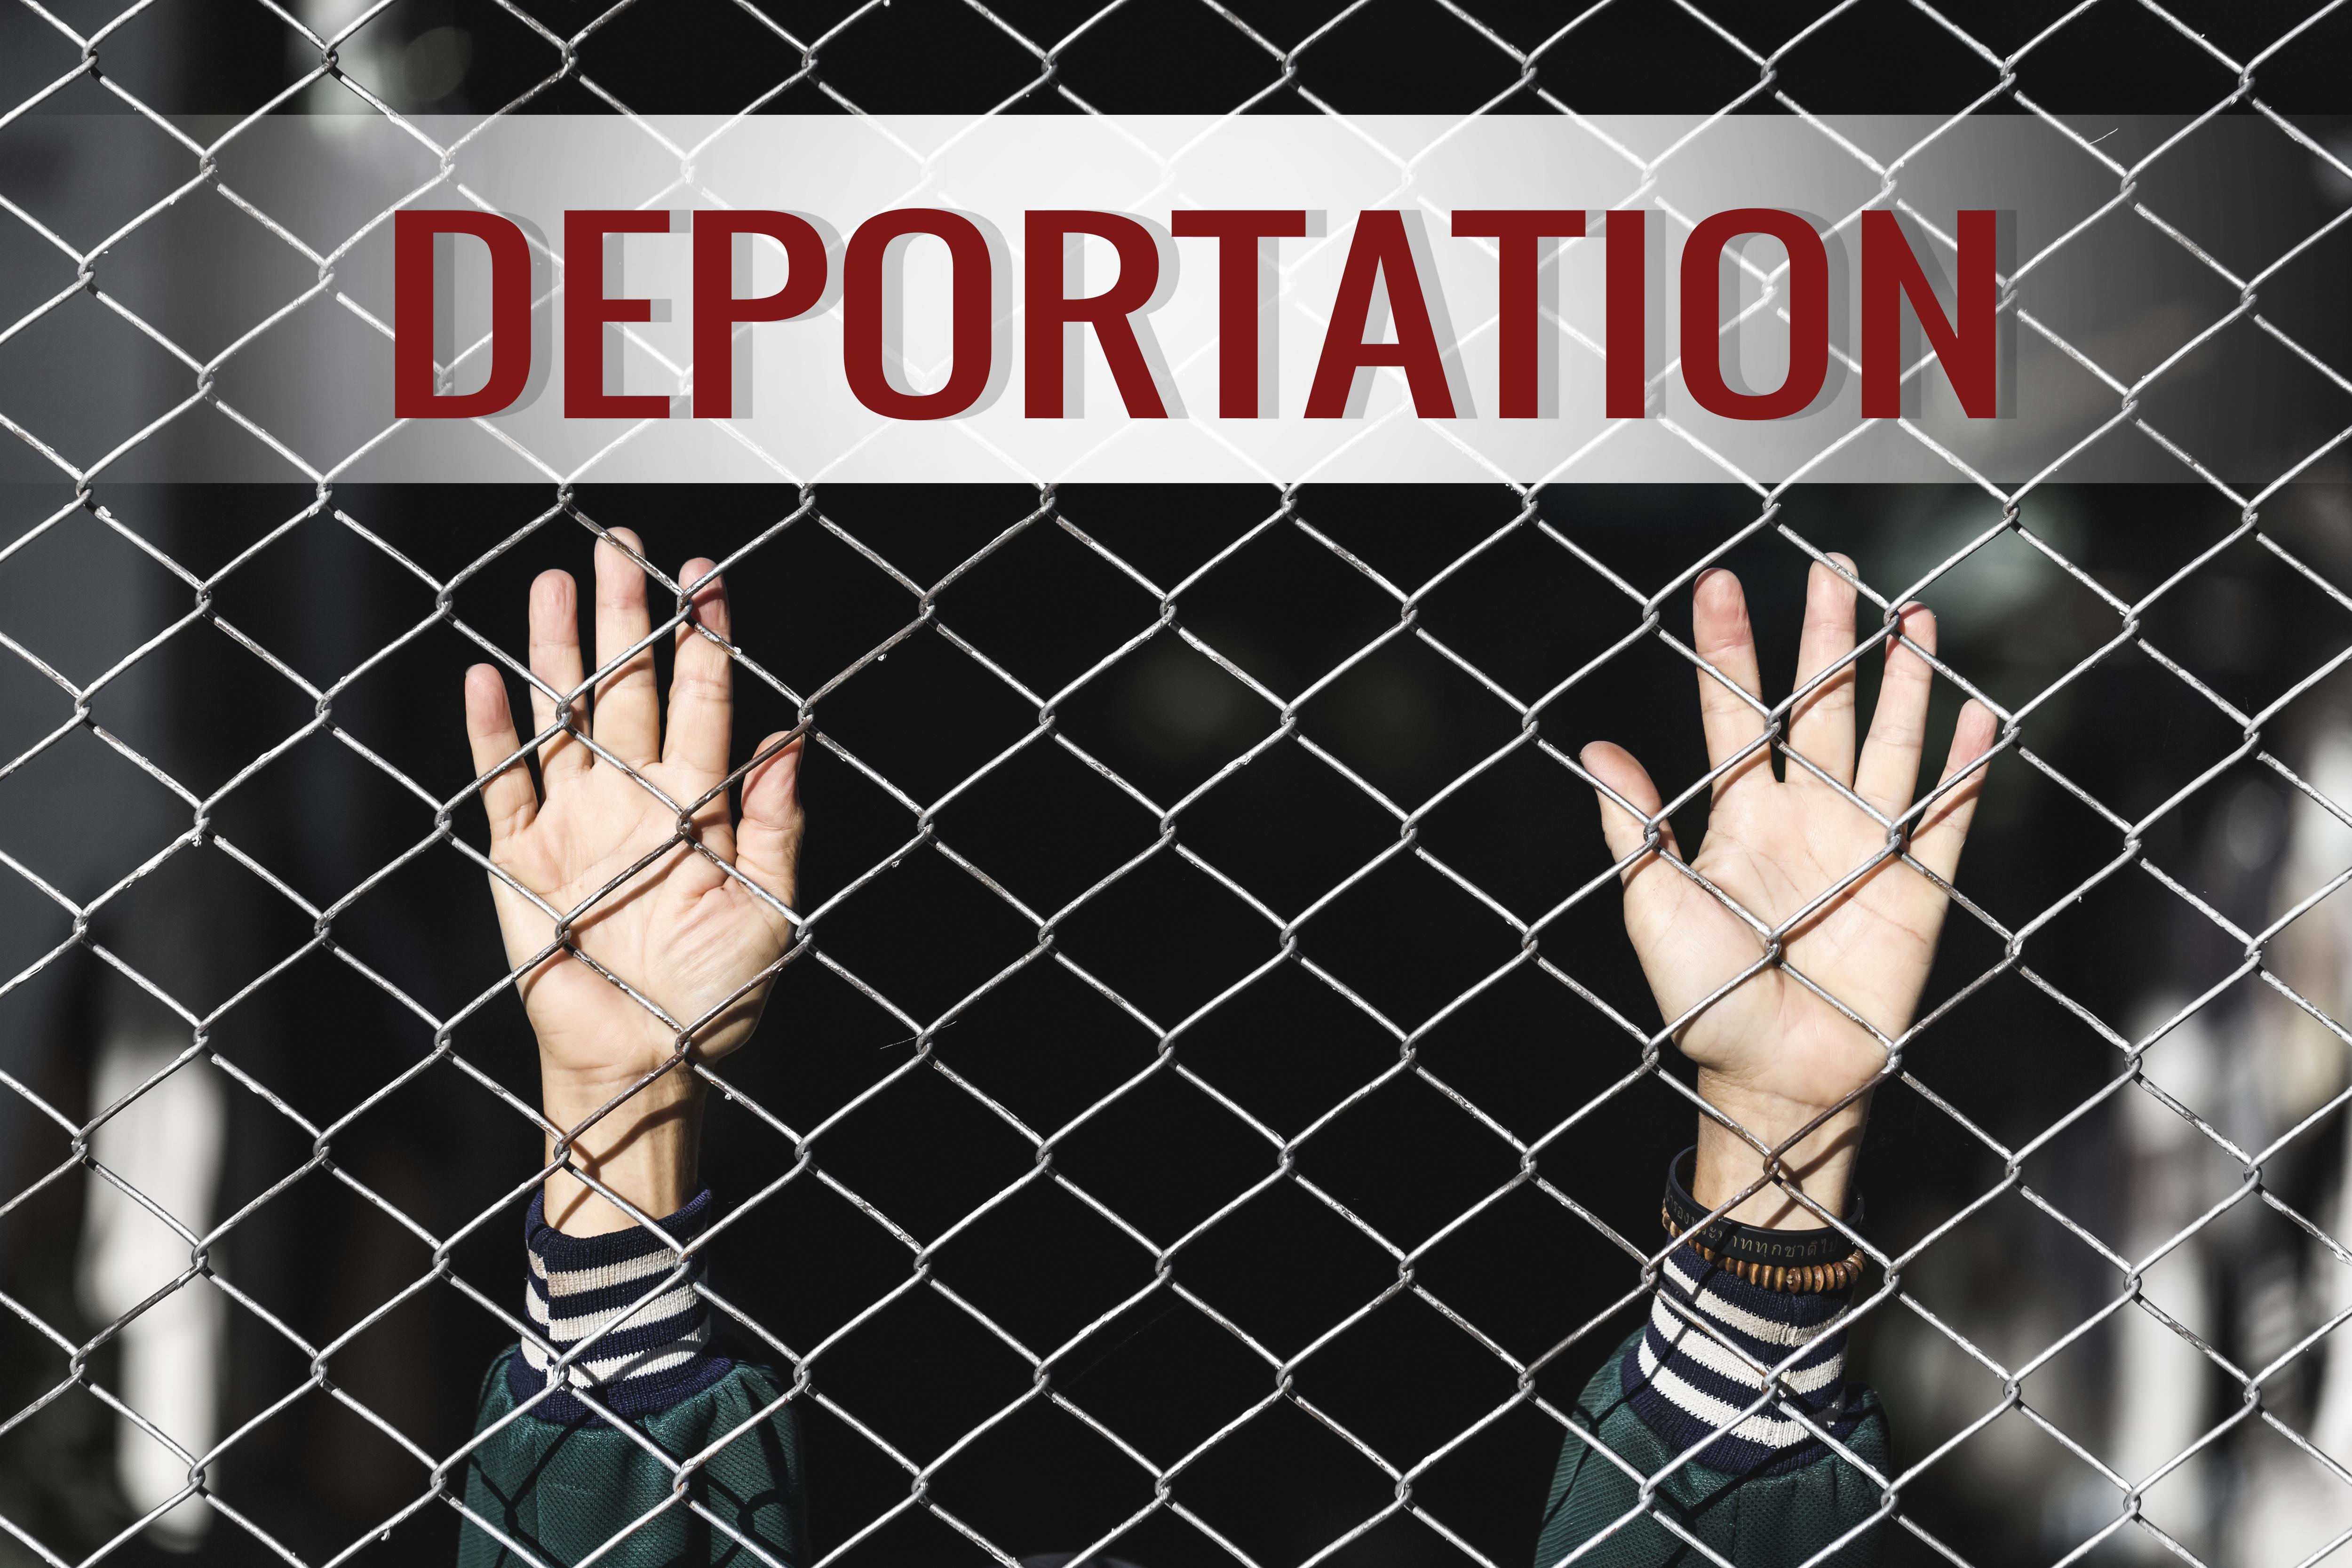 Deportation. Shutterstock